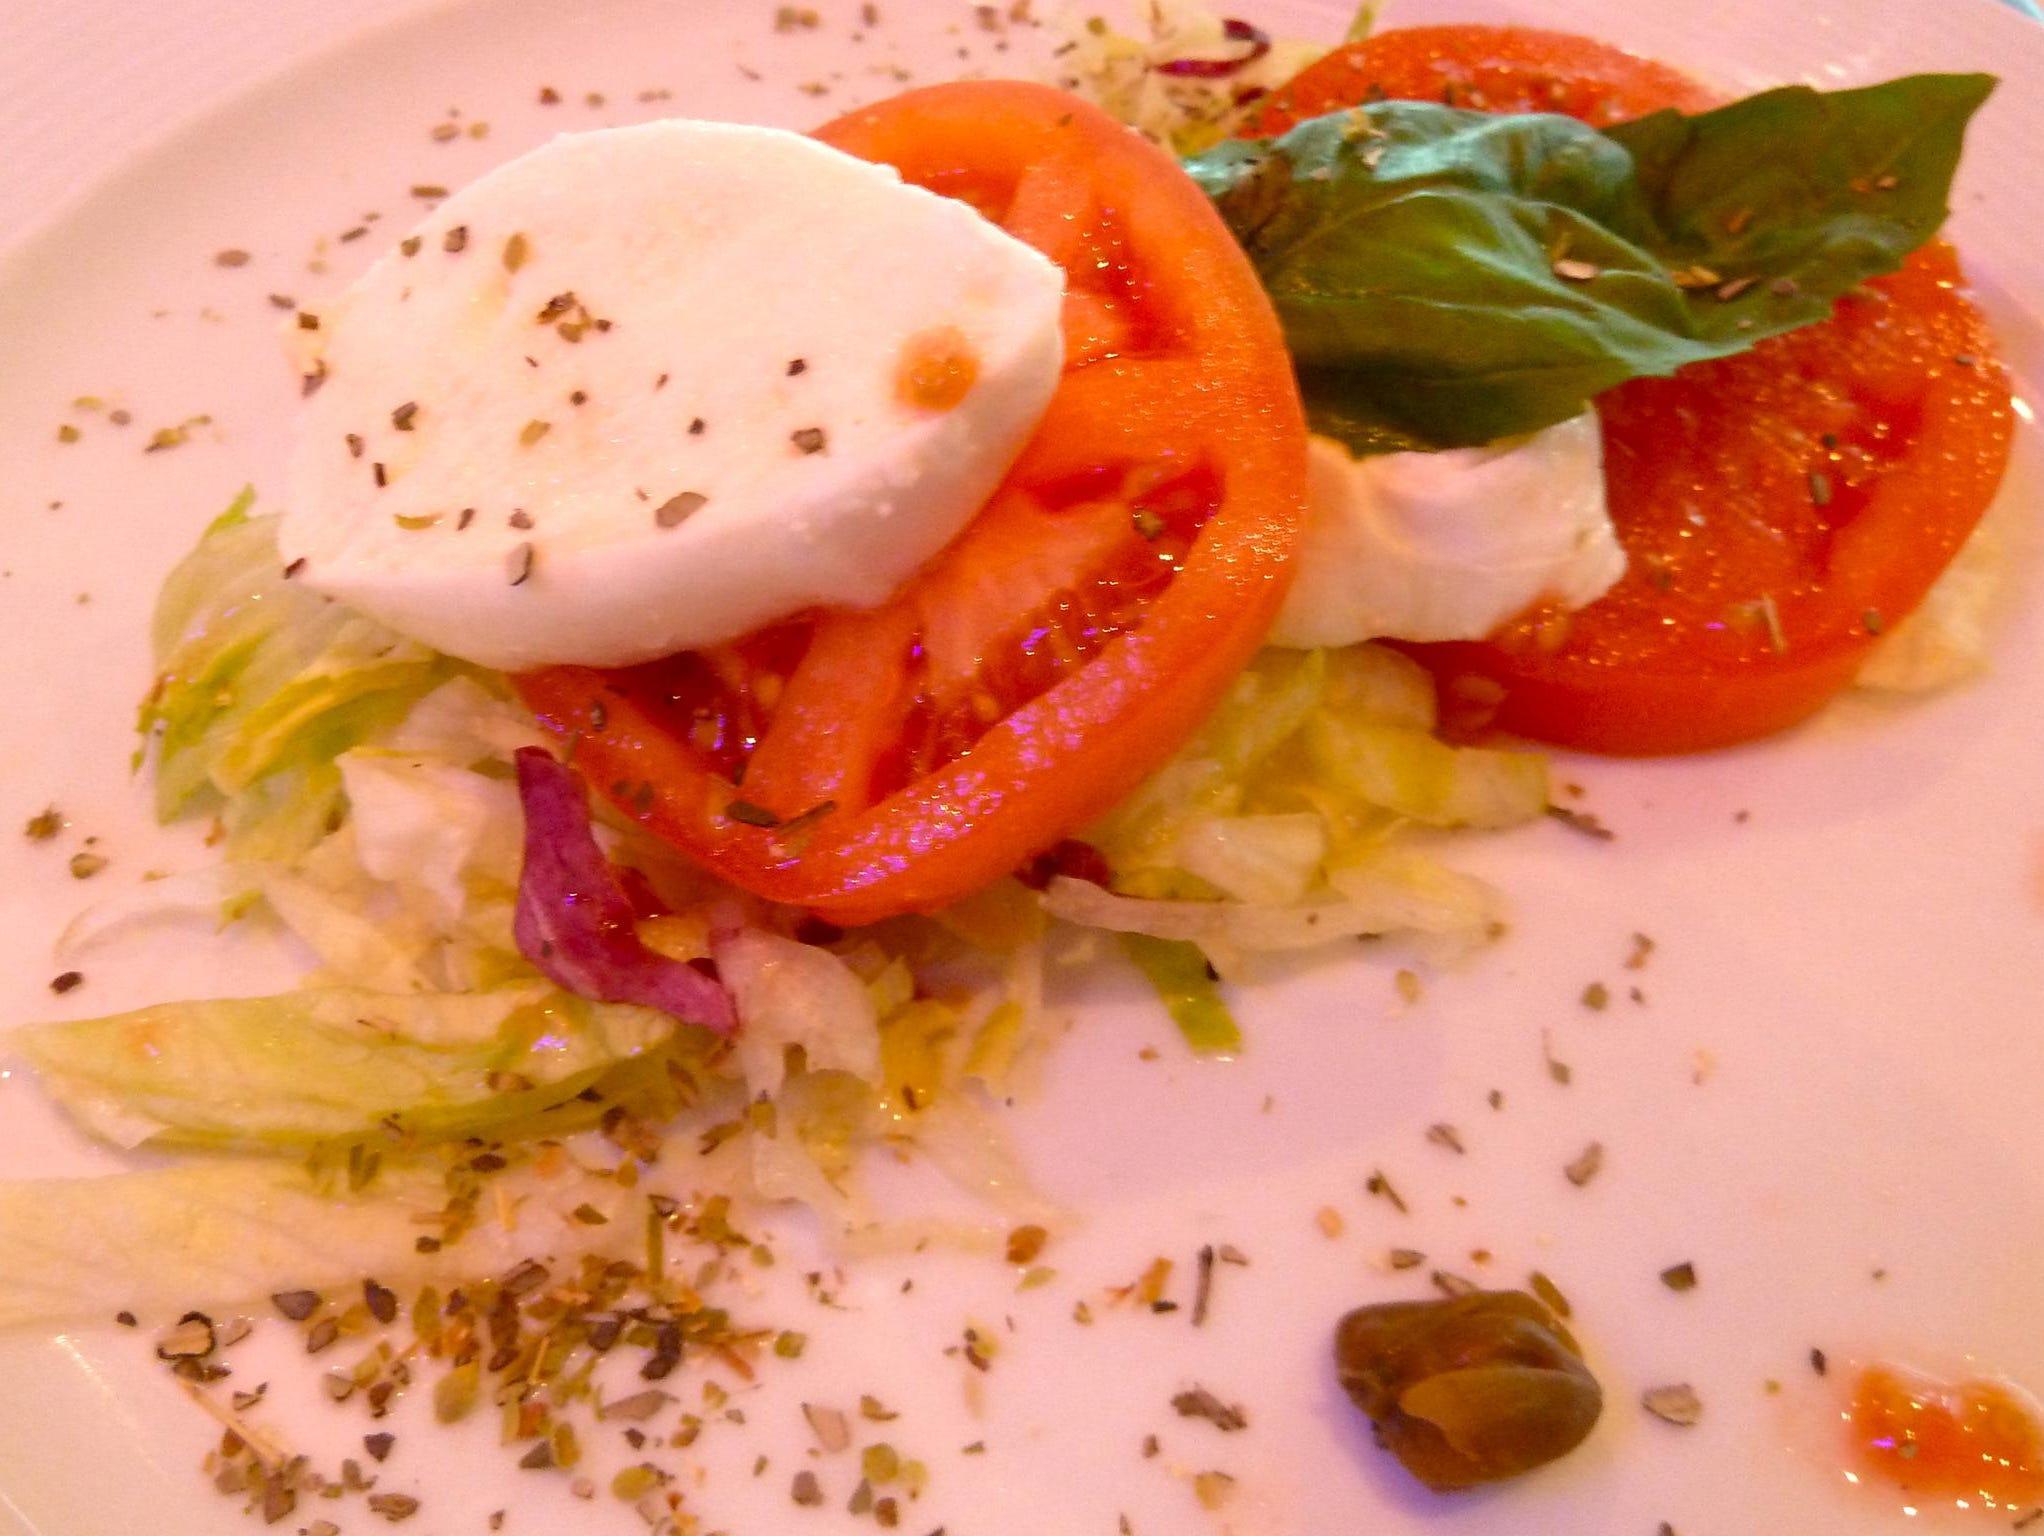 Salads include insalata Caprese with buffalo mozzarella, fresh basil, capers and oregano.